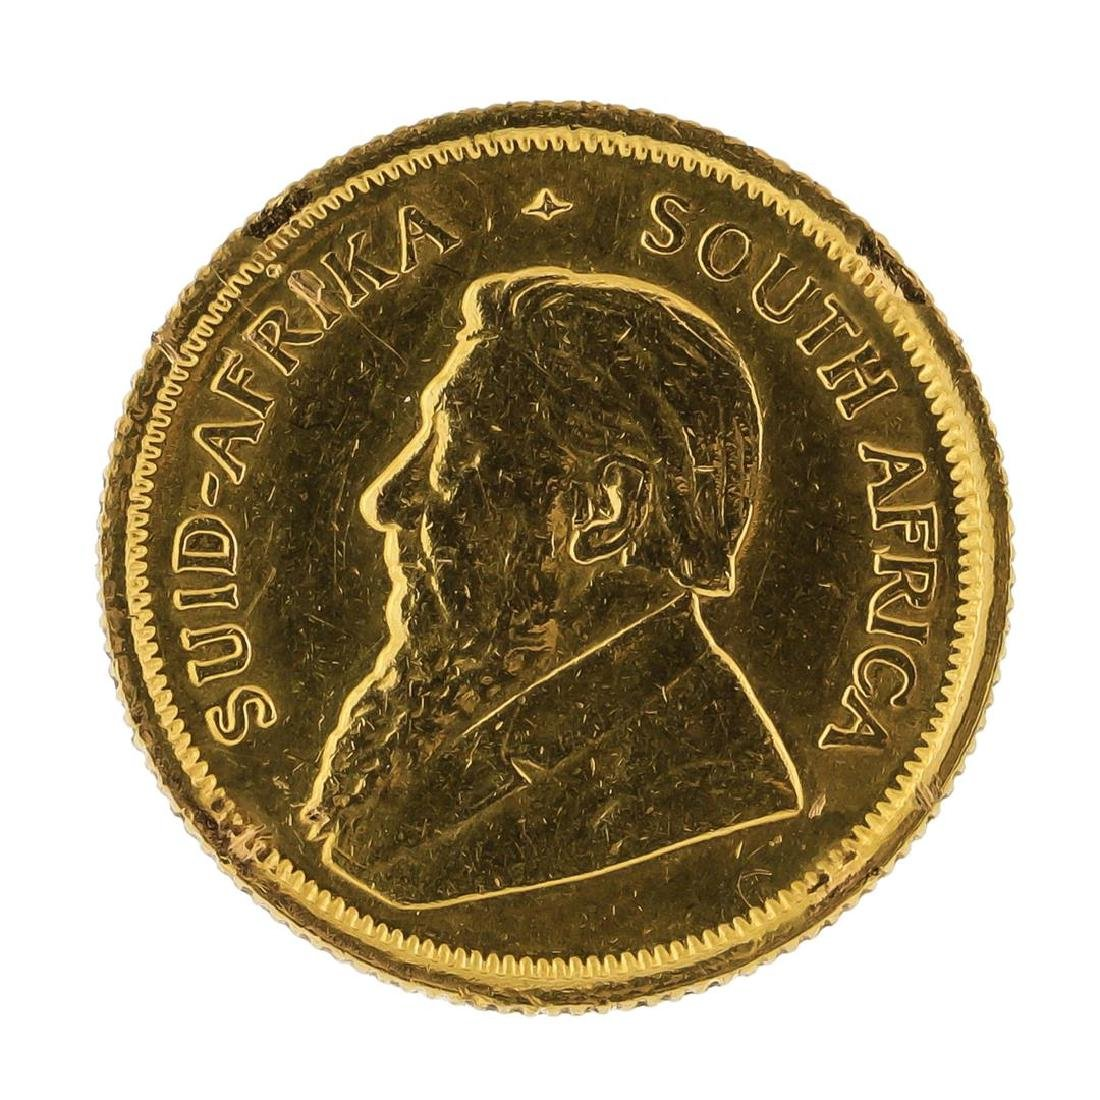 1983 Krugerrand 1/10 oz Gold Coin